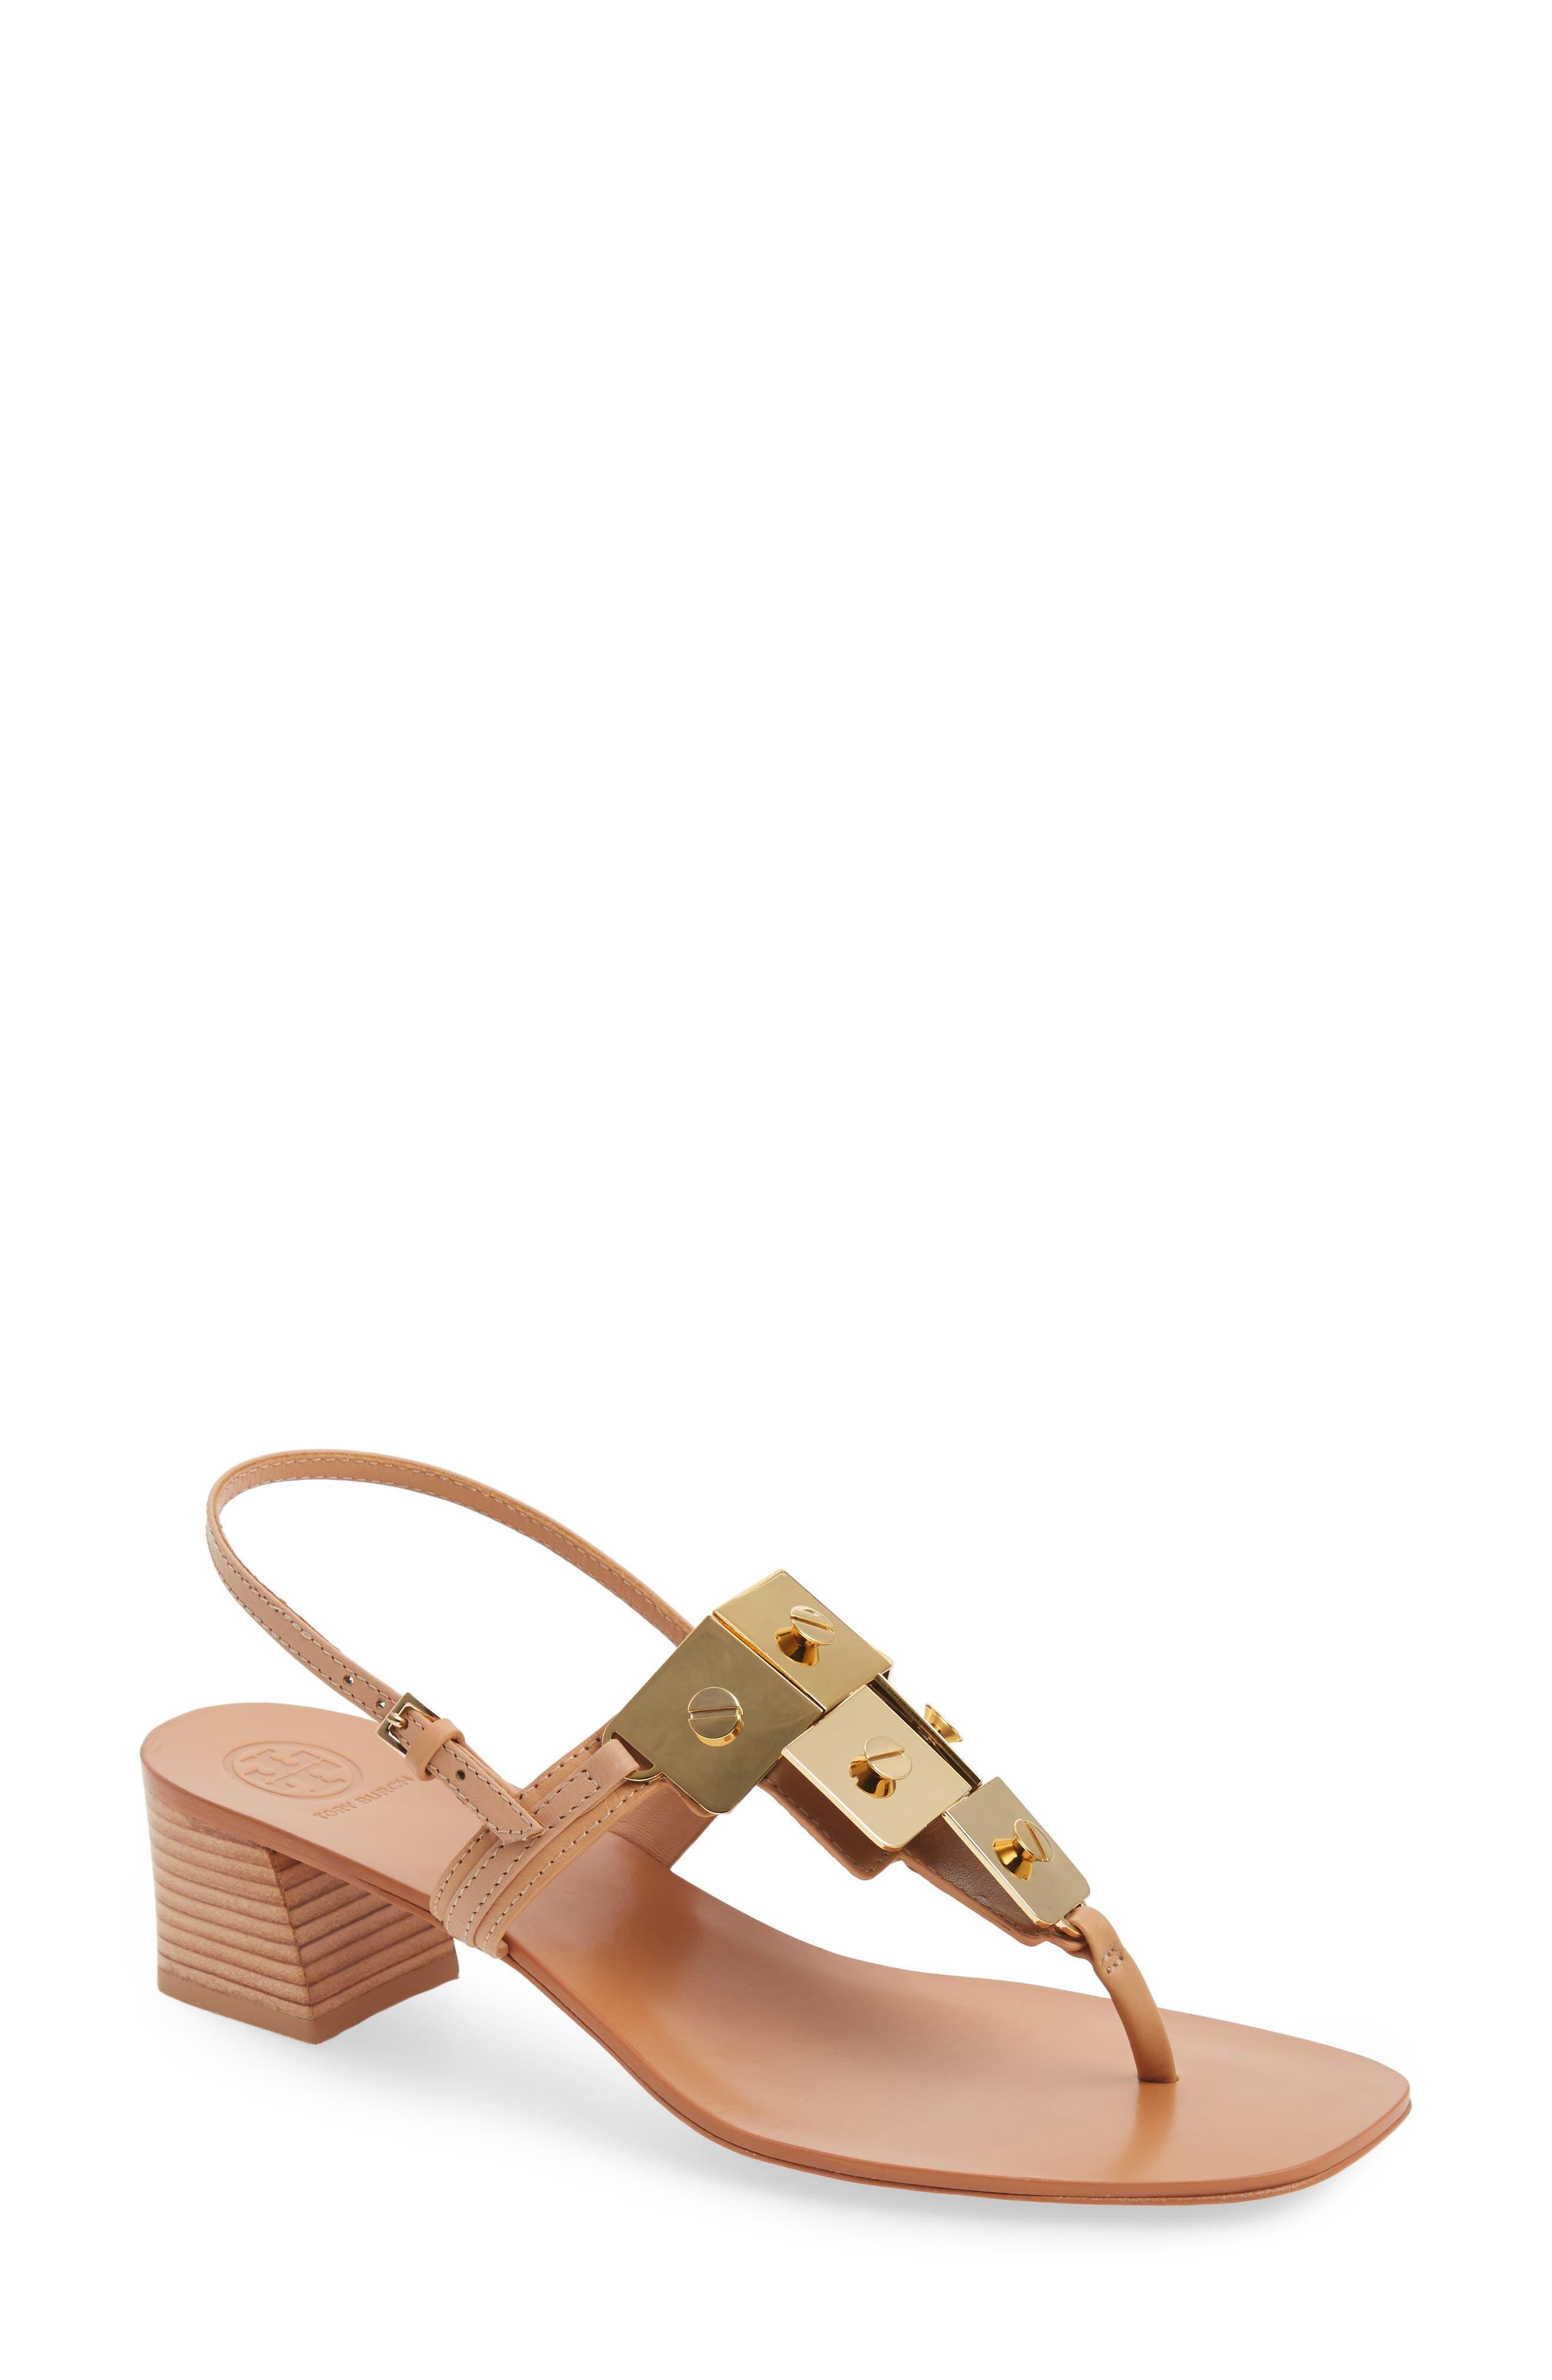 Alternate Image 1 Selected - Tory Burch Thompson Sandal (Women)